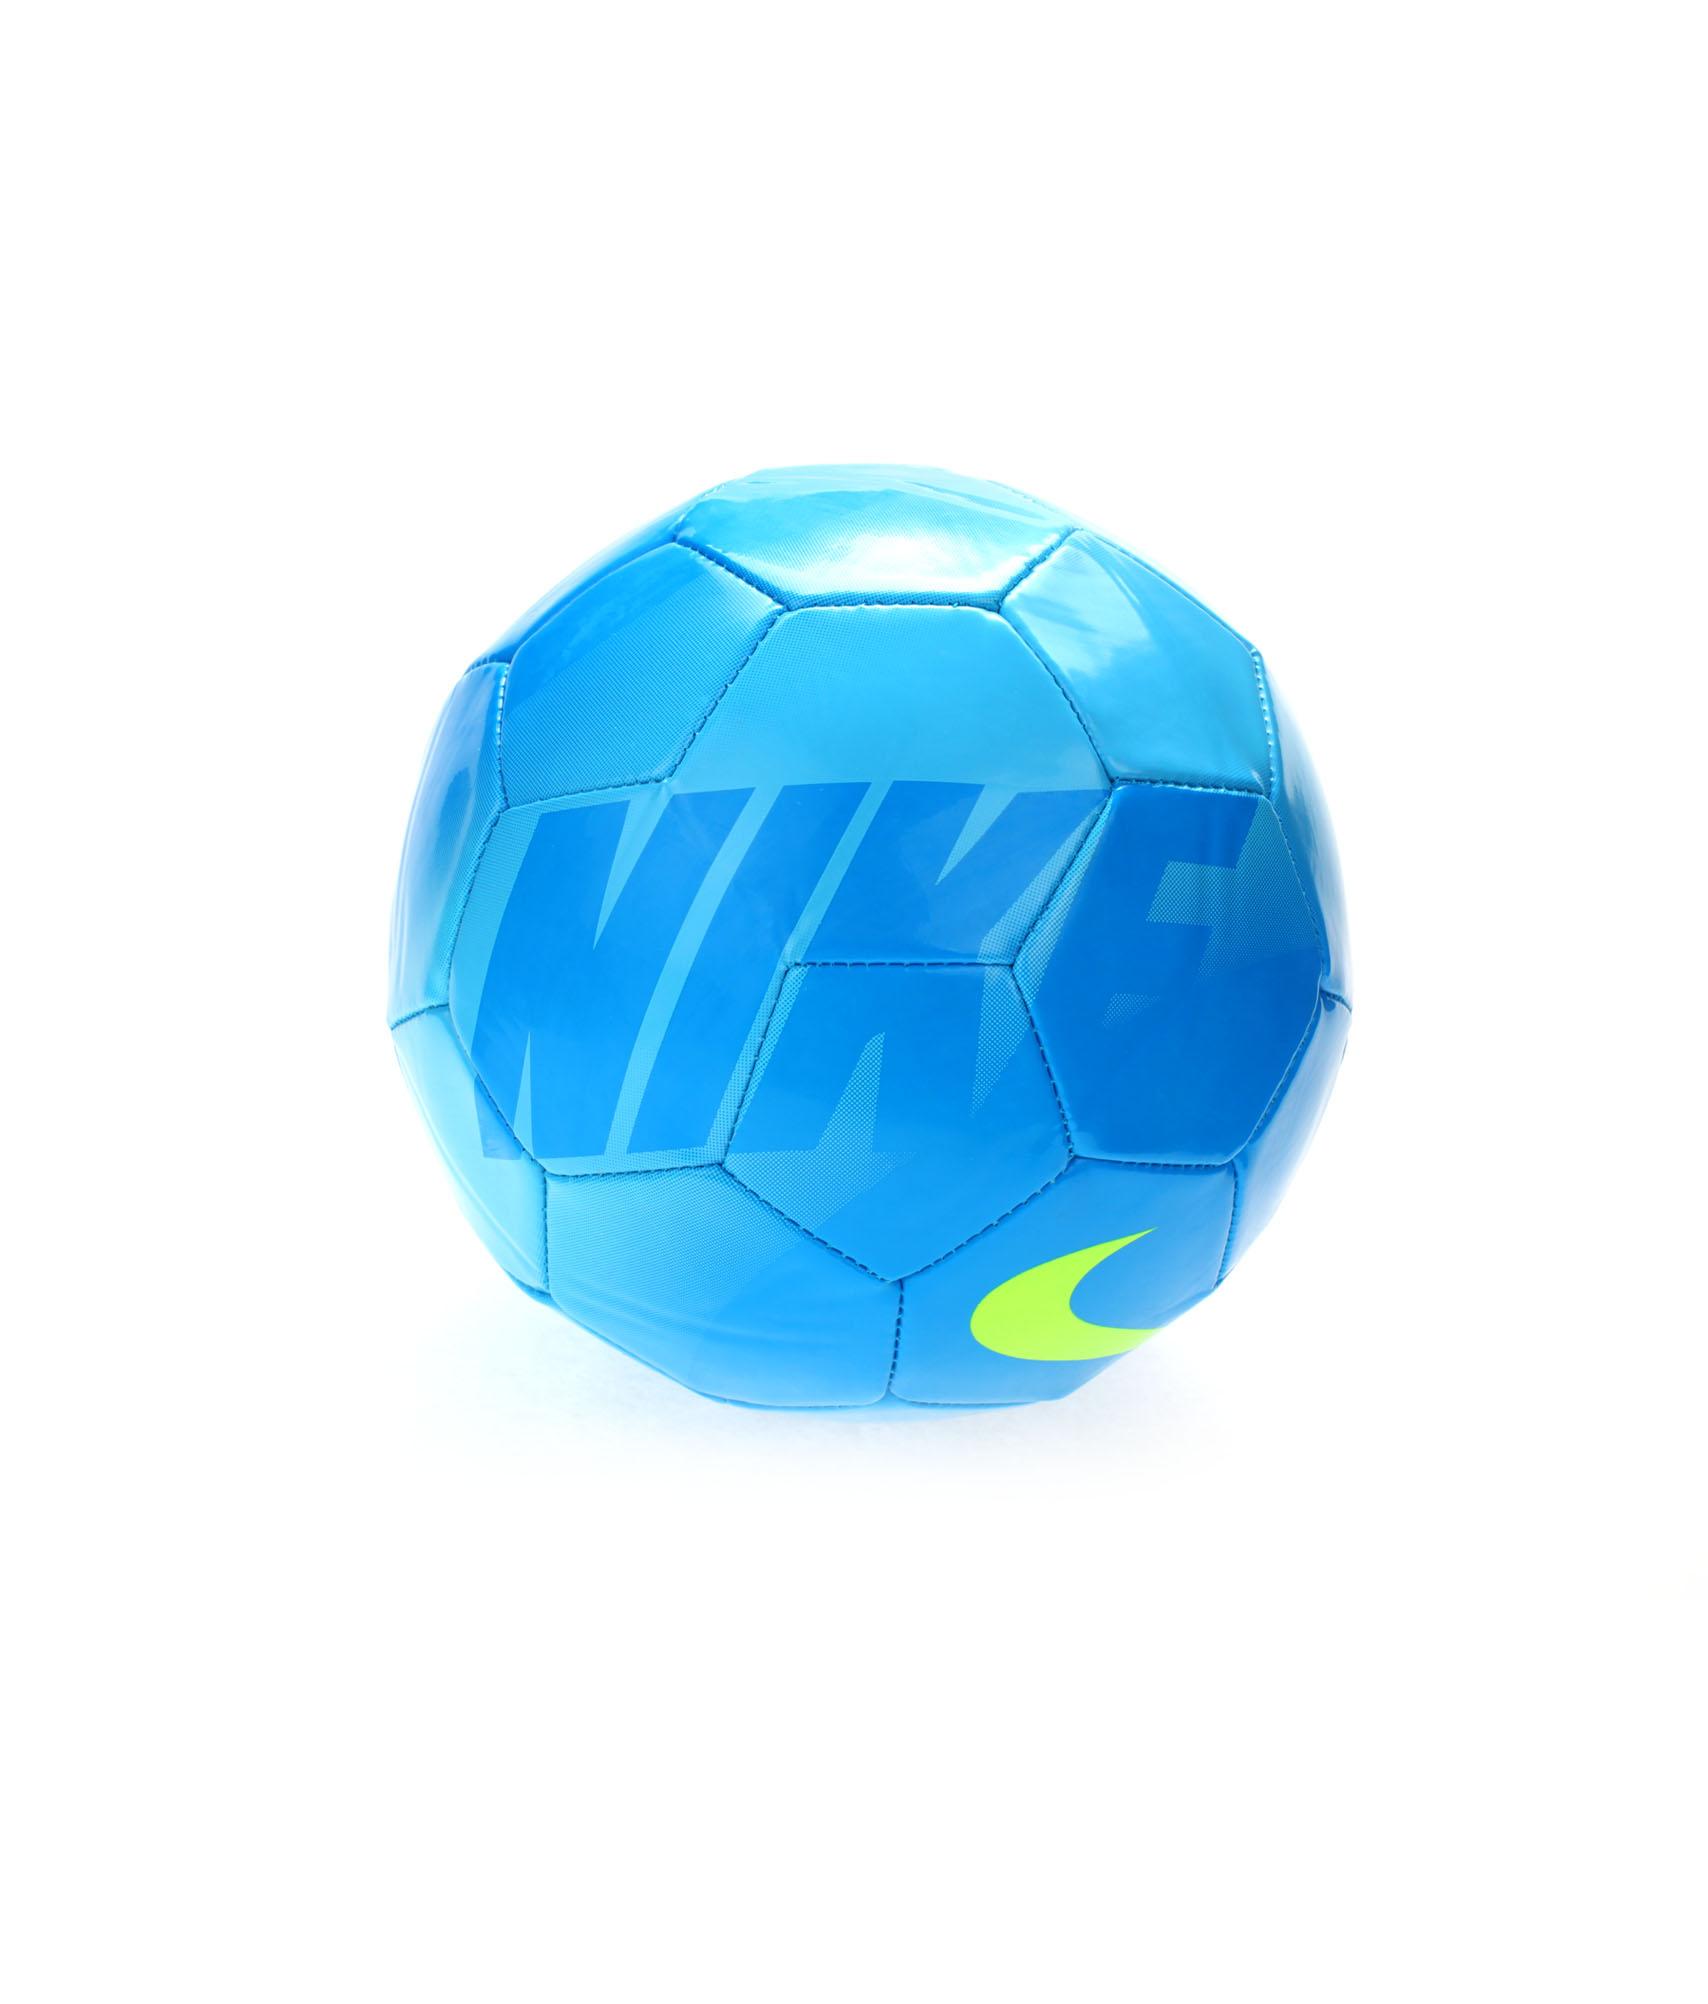 Мяч NIKE MERCURIAL FADE, Цвет-Голубой, Размер-5